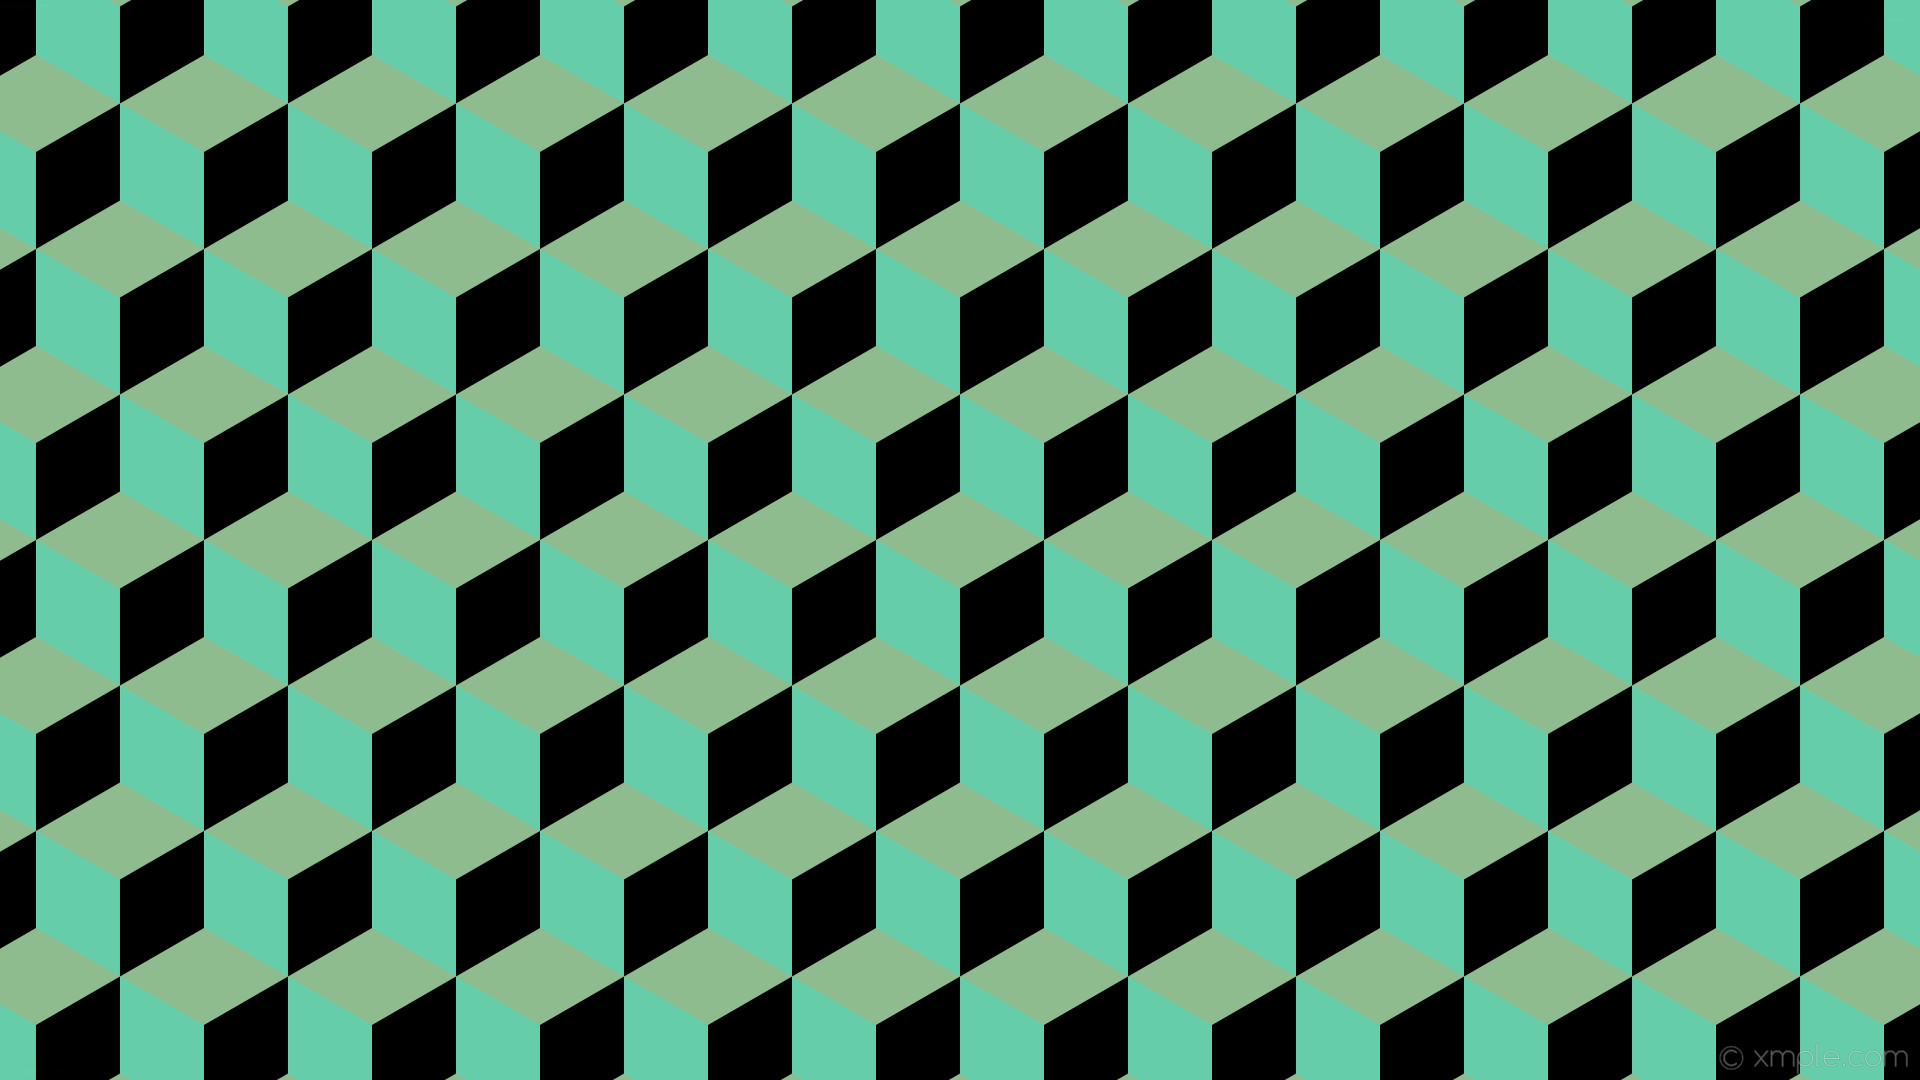 wallpaper black 3d cubes green dark sea green medium aquamarine #8fbc8f  #66cdaa #000000